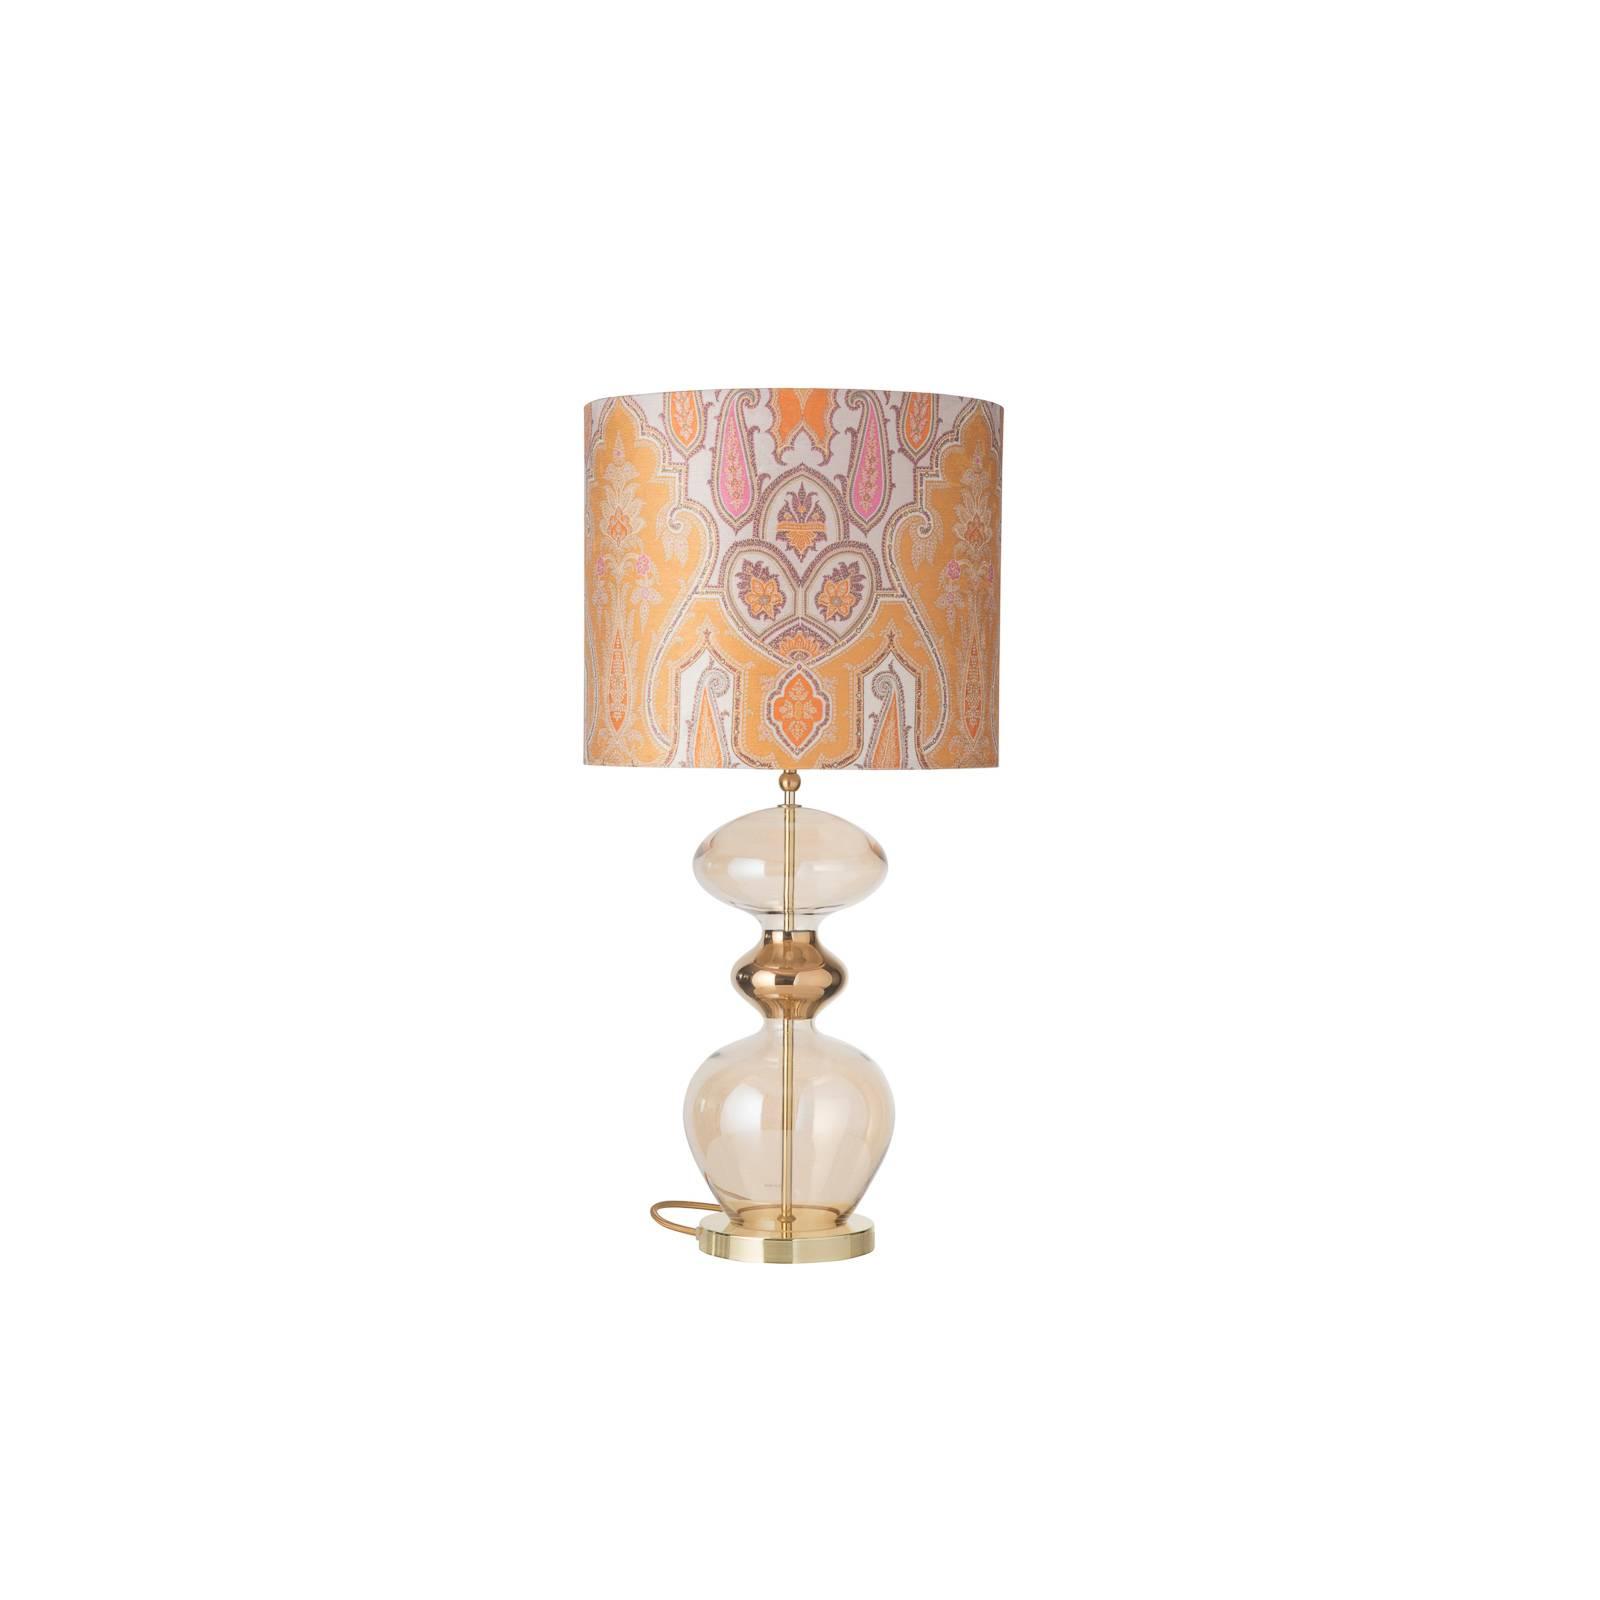 EBB & FLOW Futura lampe à poser, yellow/pink